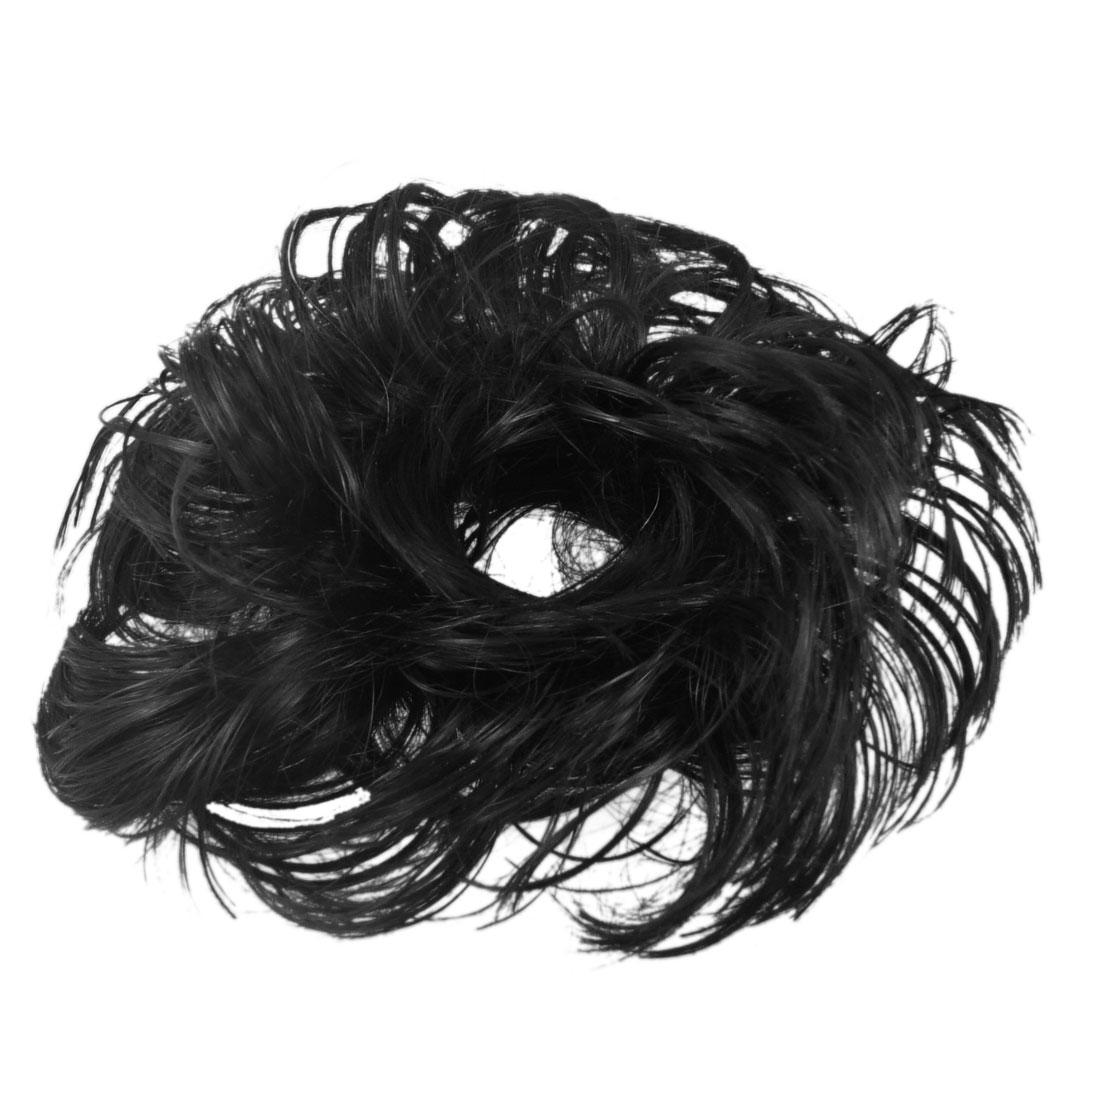 "5.5"" Dia Black DIY Party Hair Wig Wave Hairpiece Bun for Girl Woman"